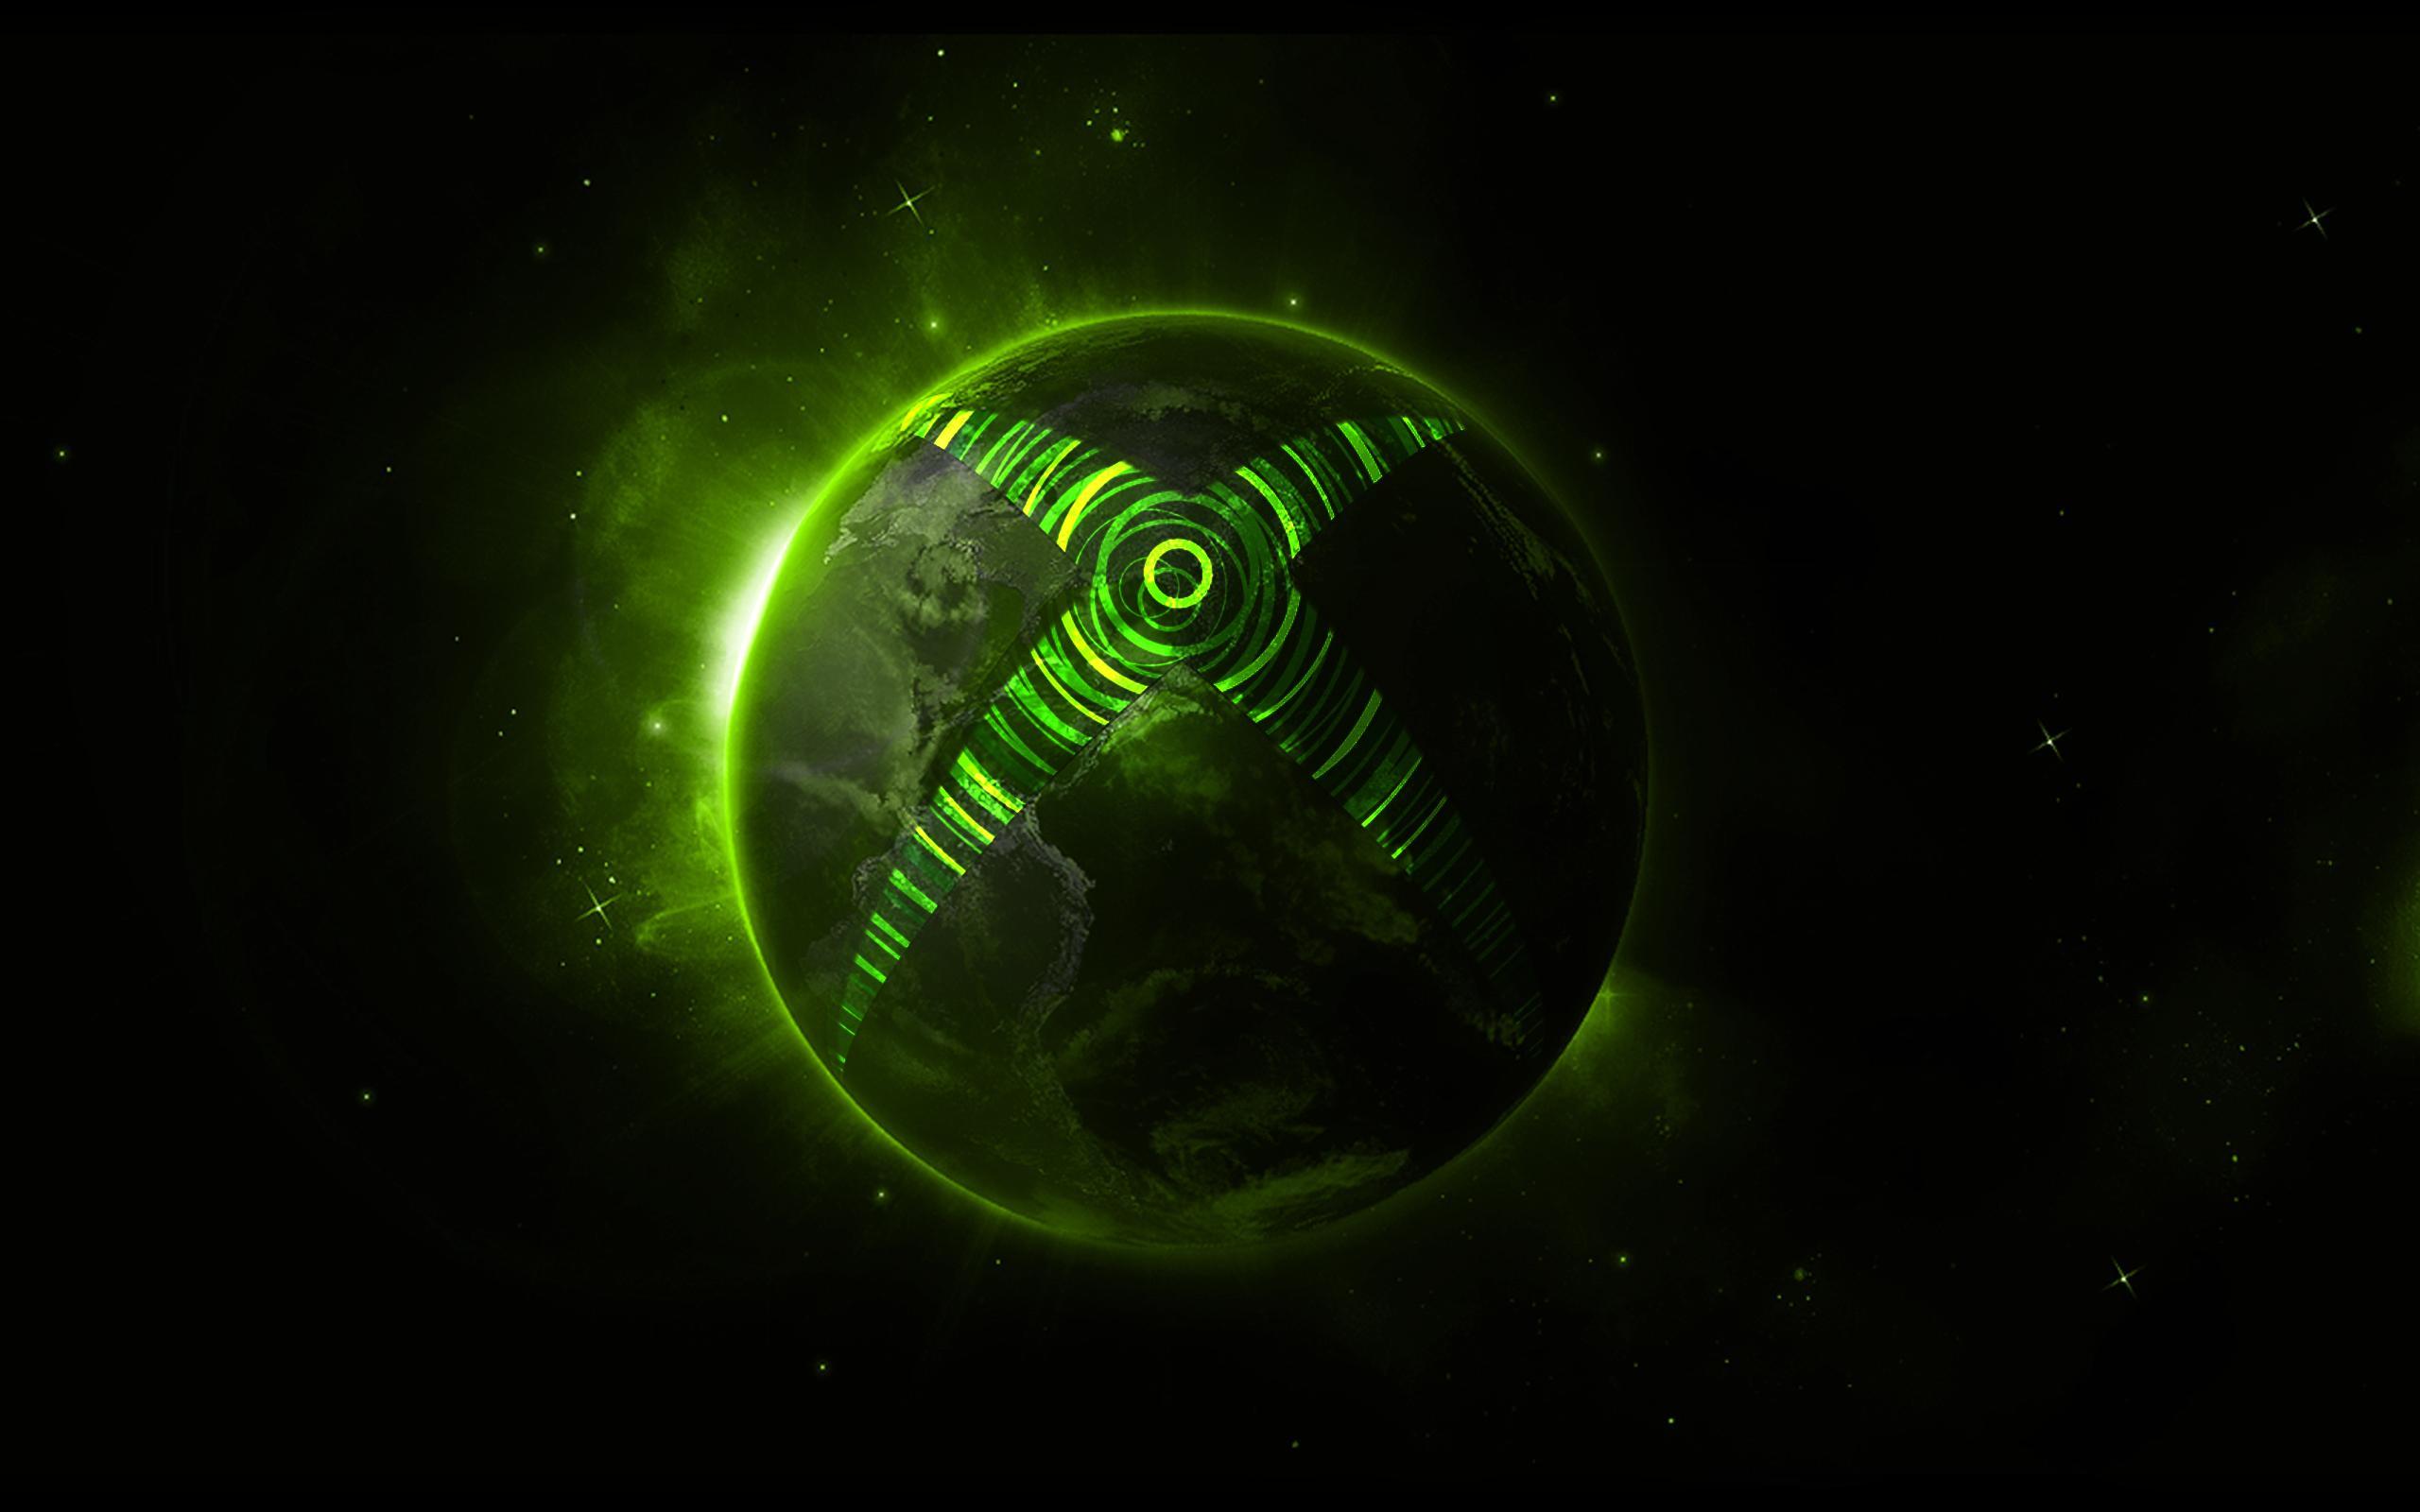 Download Wallpaper Logo Xbox One - Xbox-Wallpaper-01-2560x1600  Trends_437366.jpg